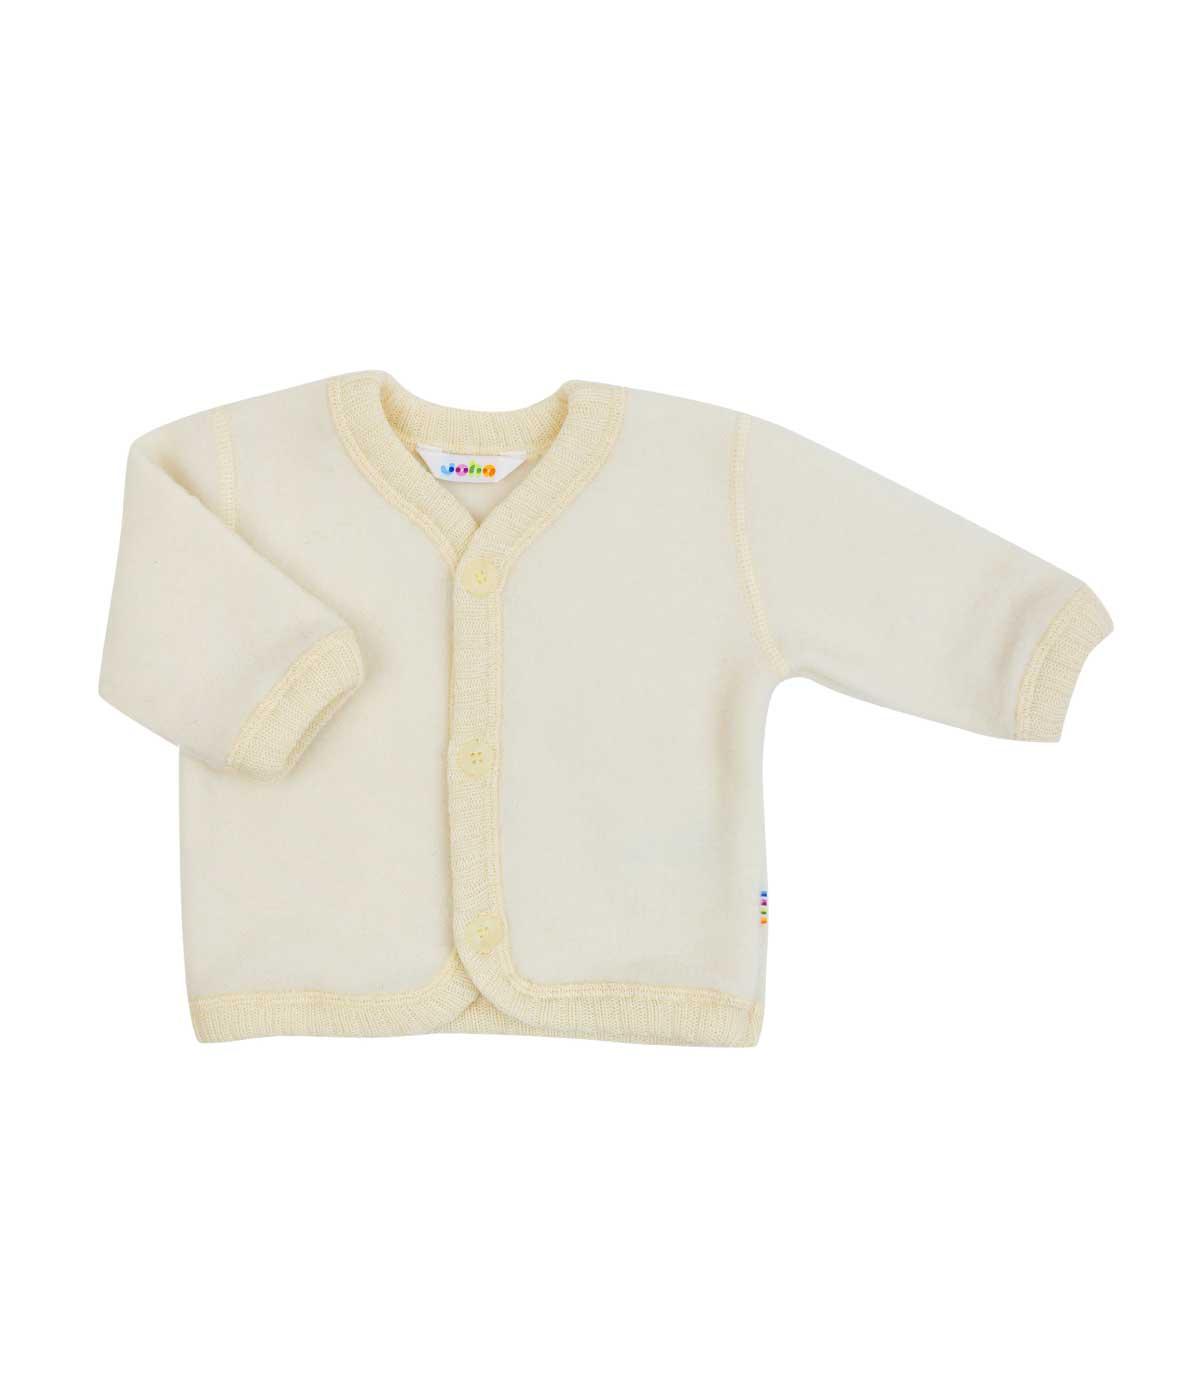 dfcc1005073 Cardigan / jakke i uld fleece, natur fra Joha